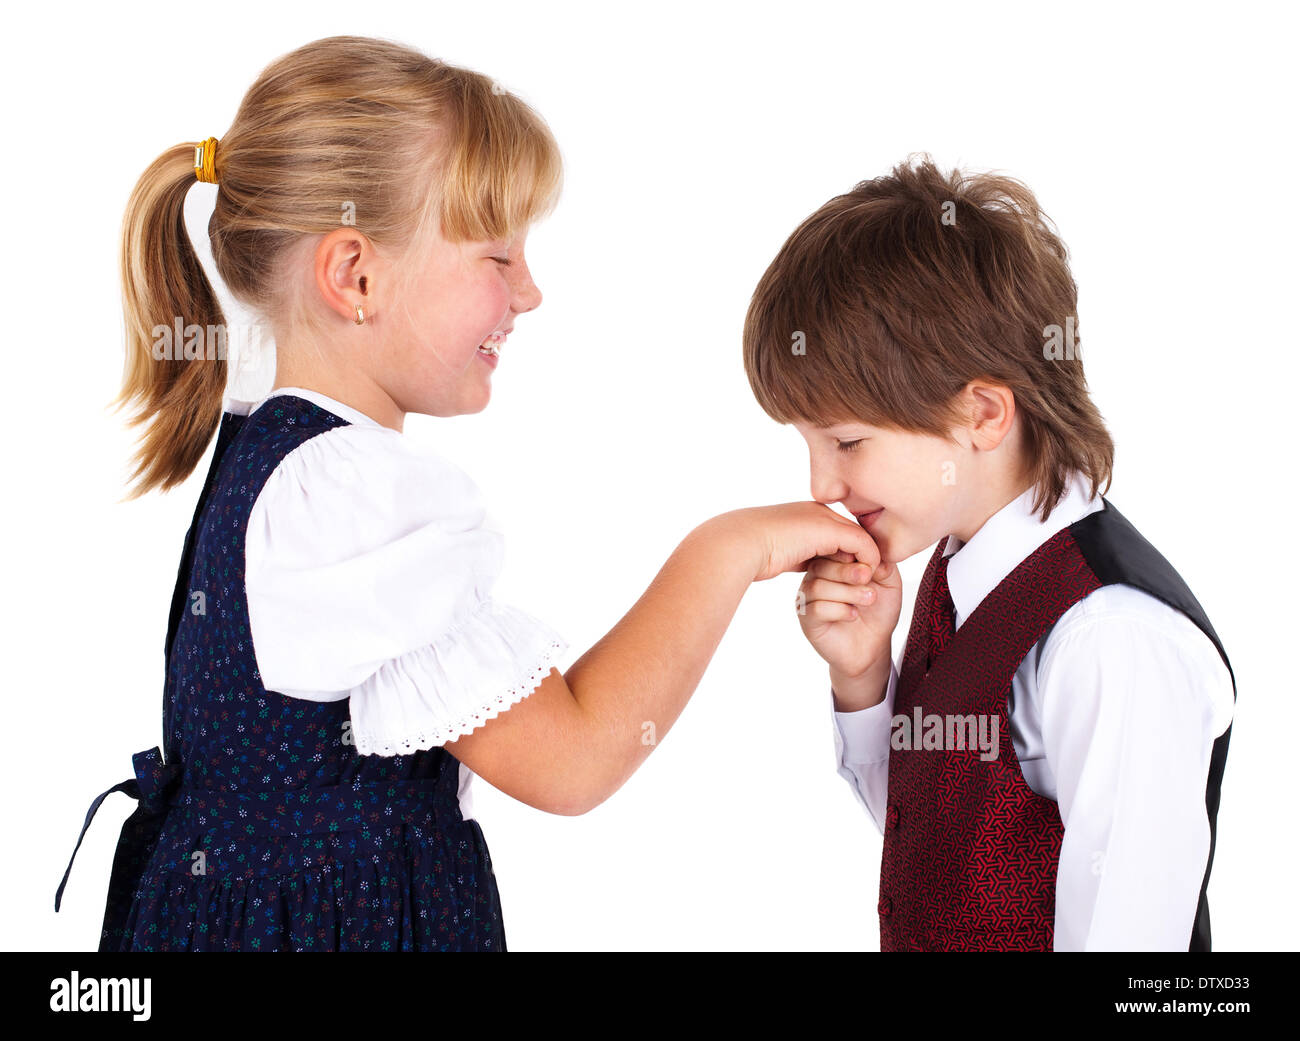 Little boy kissing hand stock photo royalty free image 66963879 little boy kissing hand thecheapjerseys Images